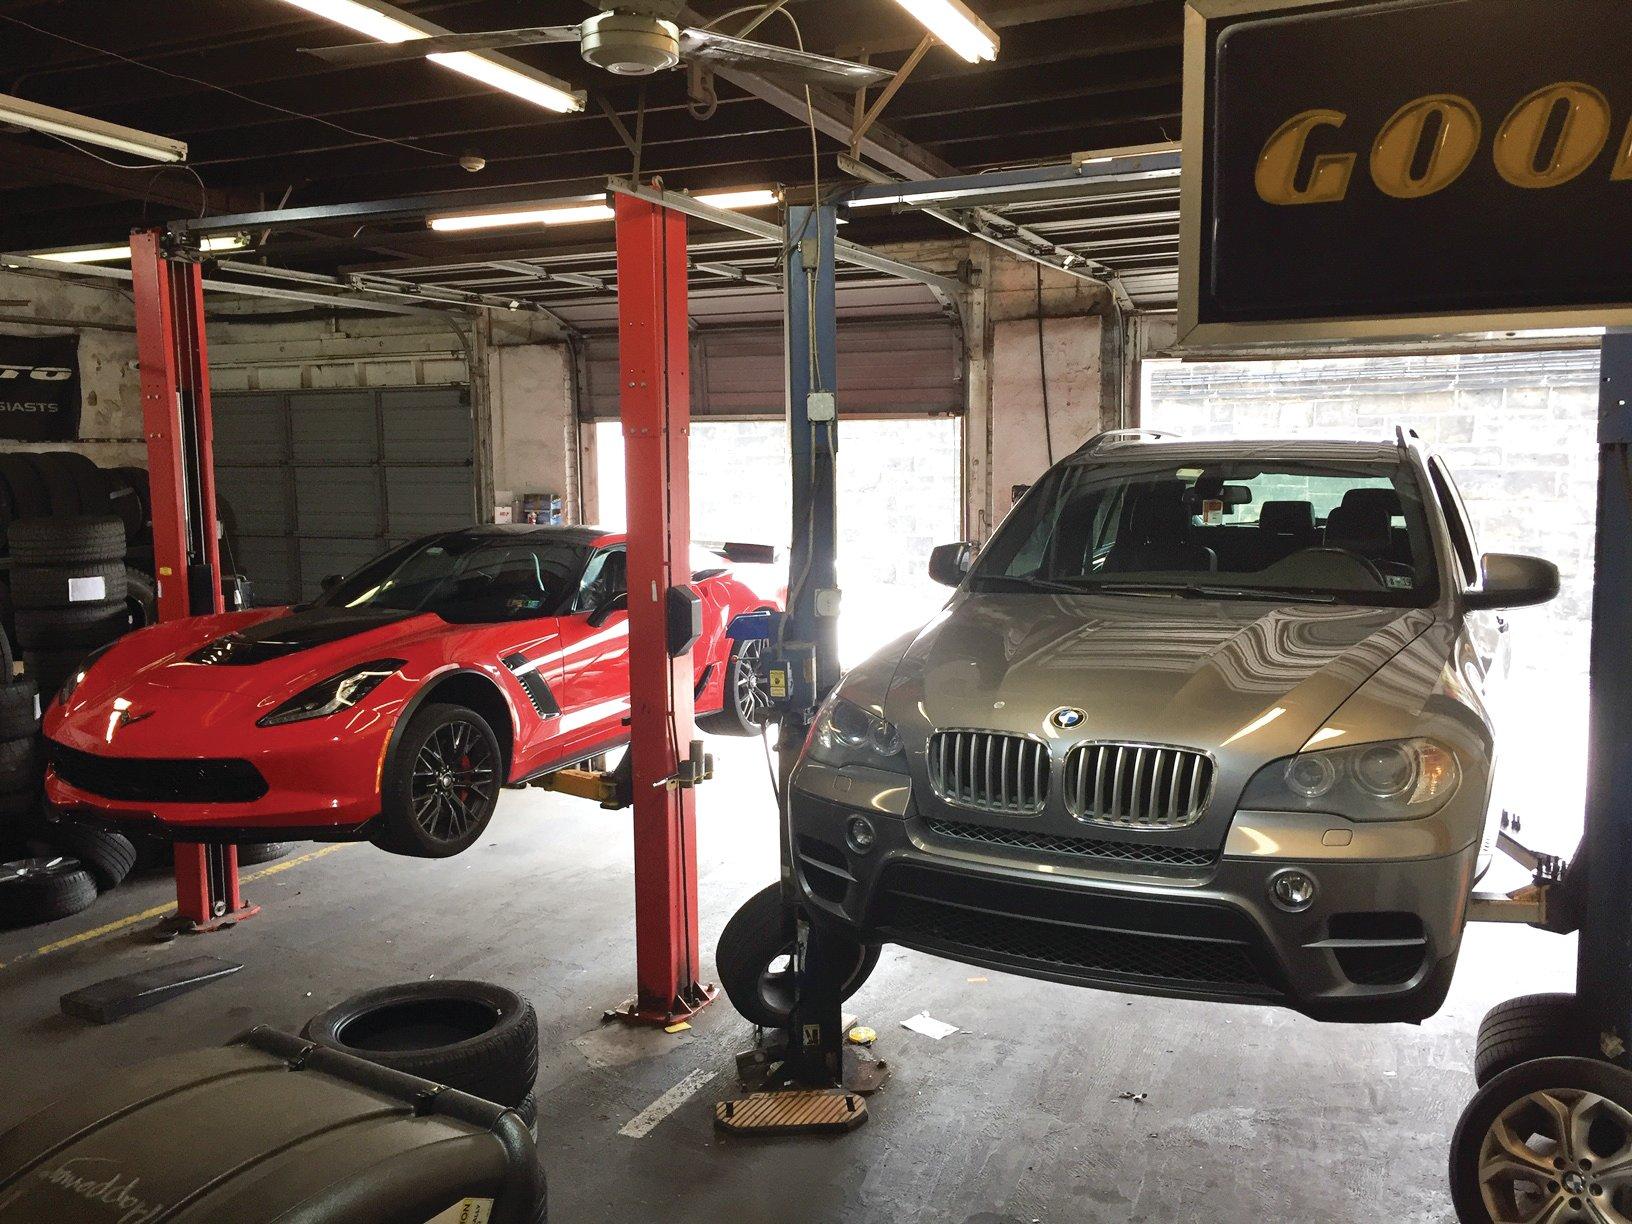 Spotting Damaged Wheels Boosts Profits